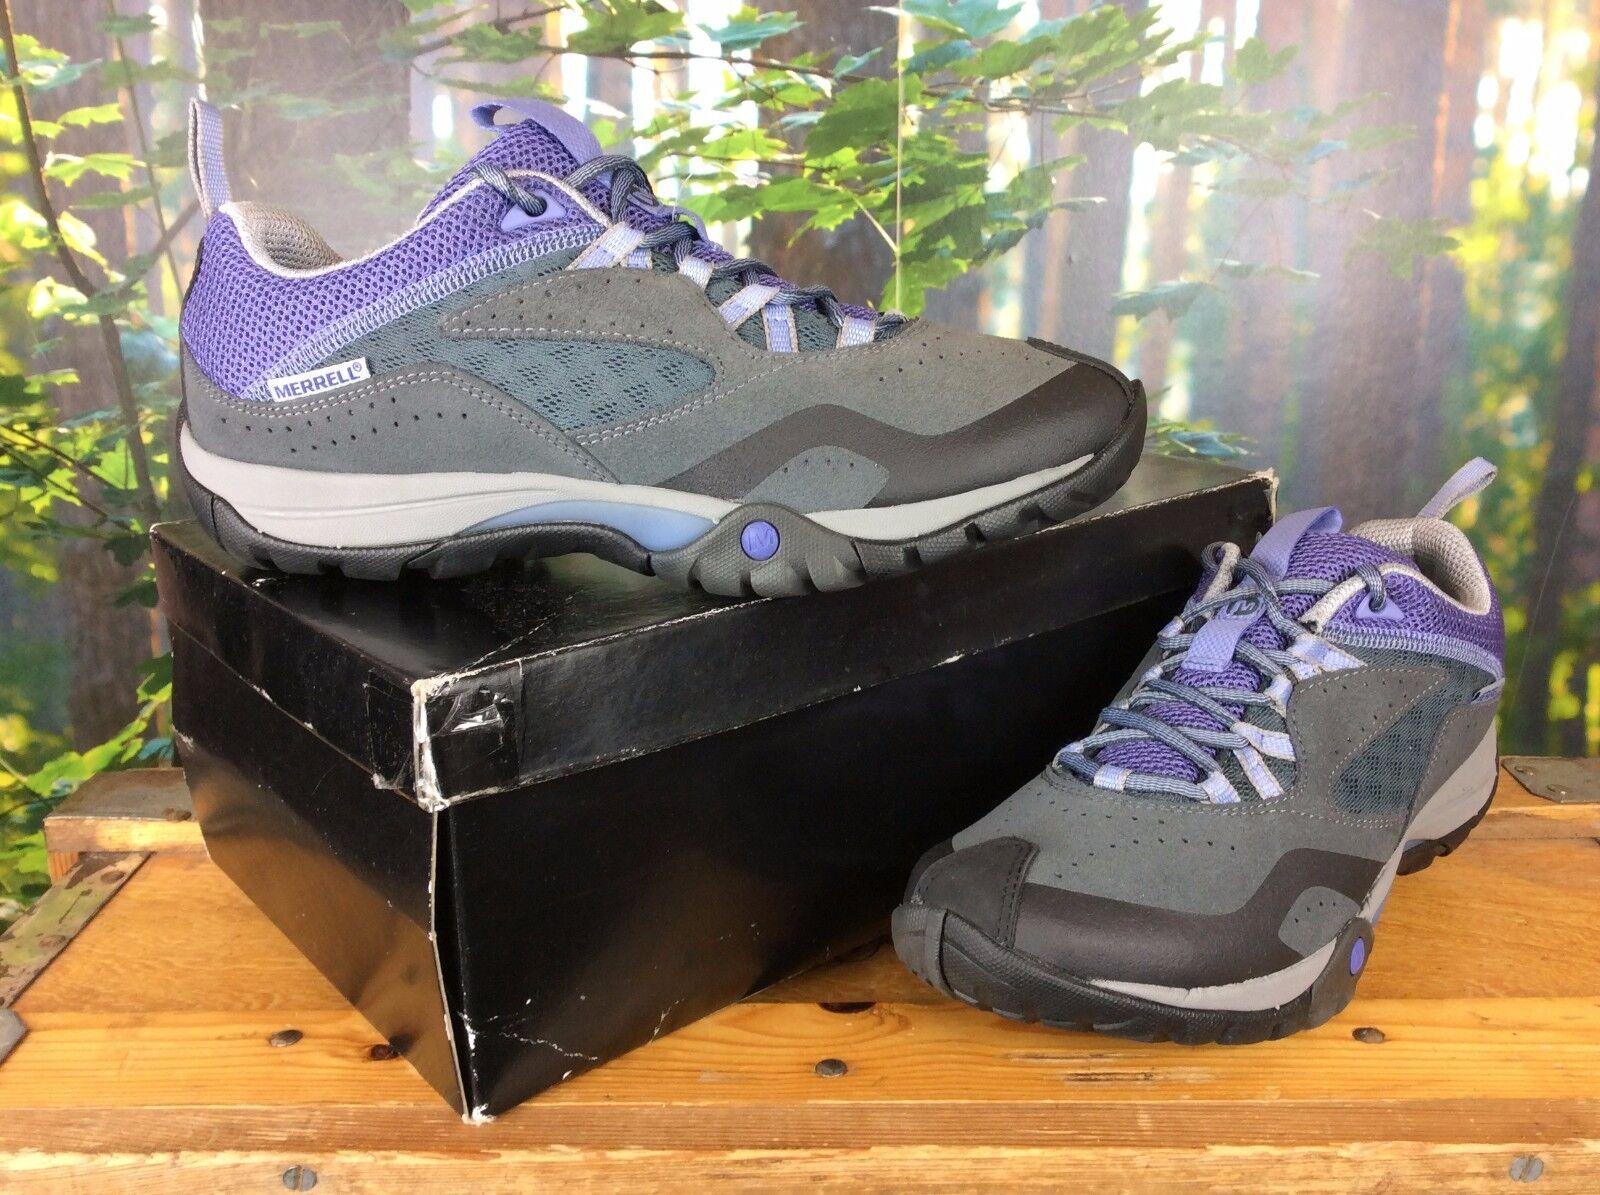 MERRELL 39 LADIES UK 6 EU 39 MERRELL GREY PURPLE AZURA TURBULENCE WALKING Schuhe 23745c